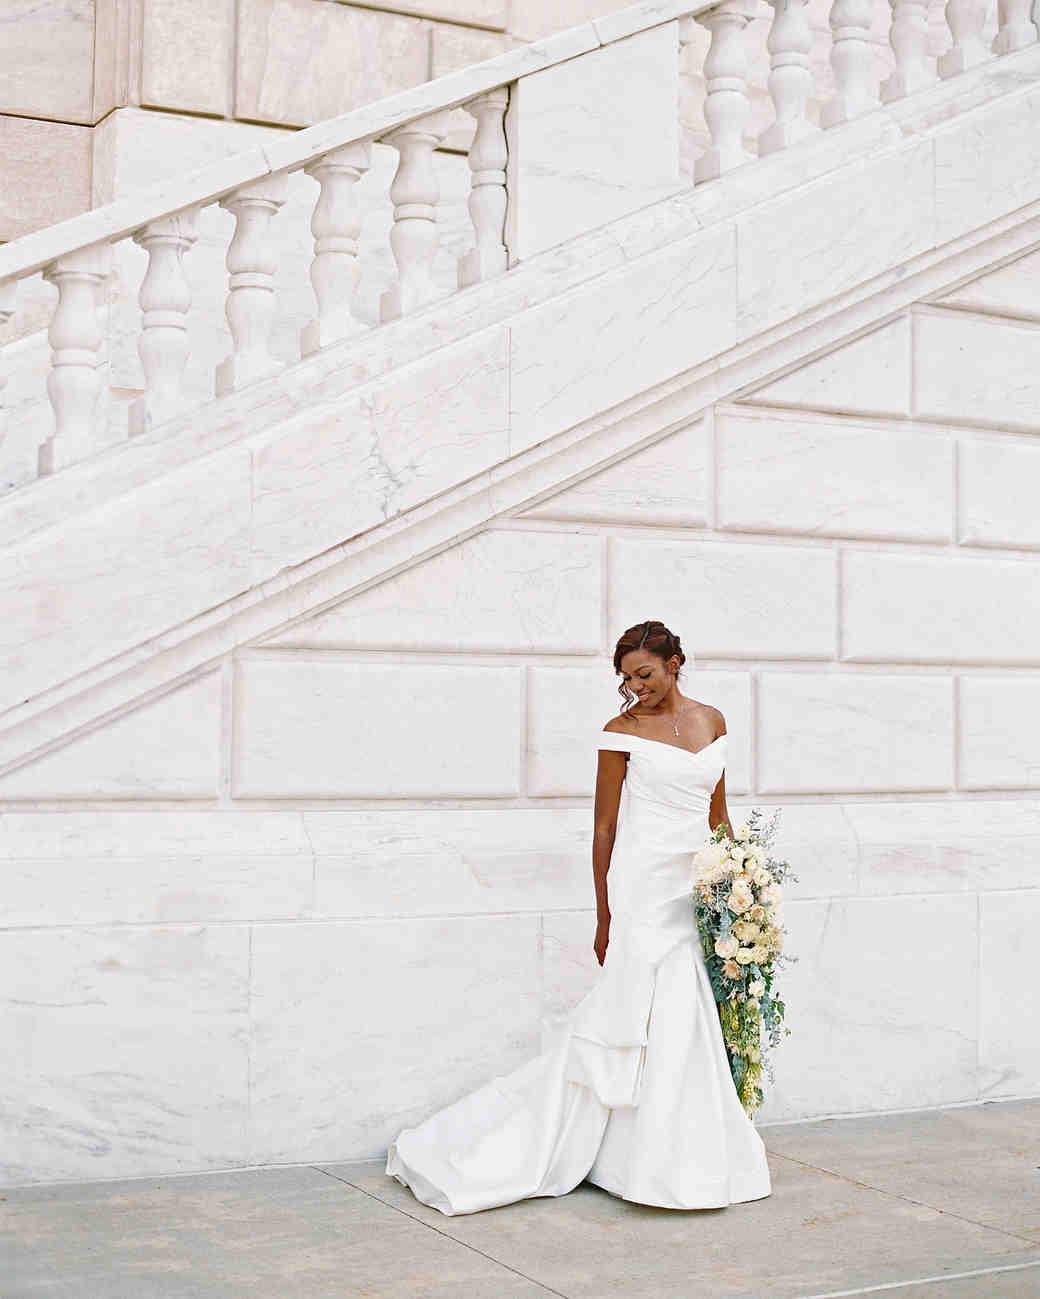 meki ian wedding michigan bride